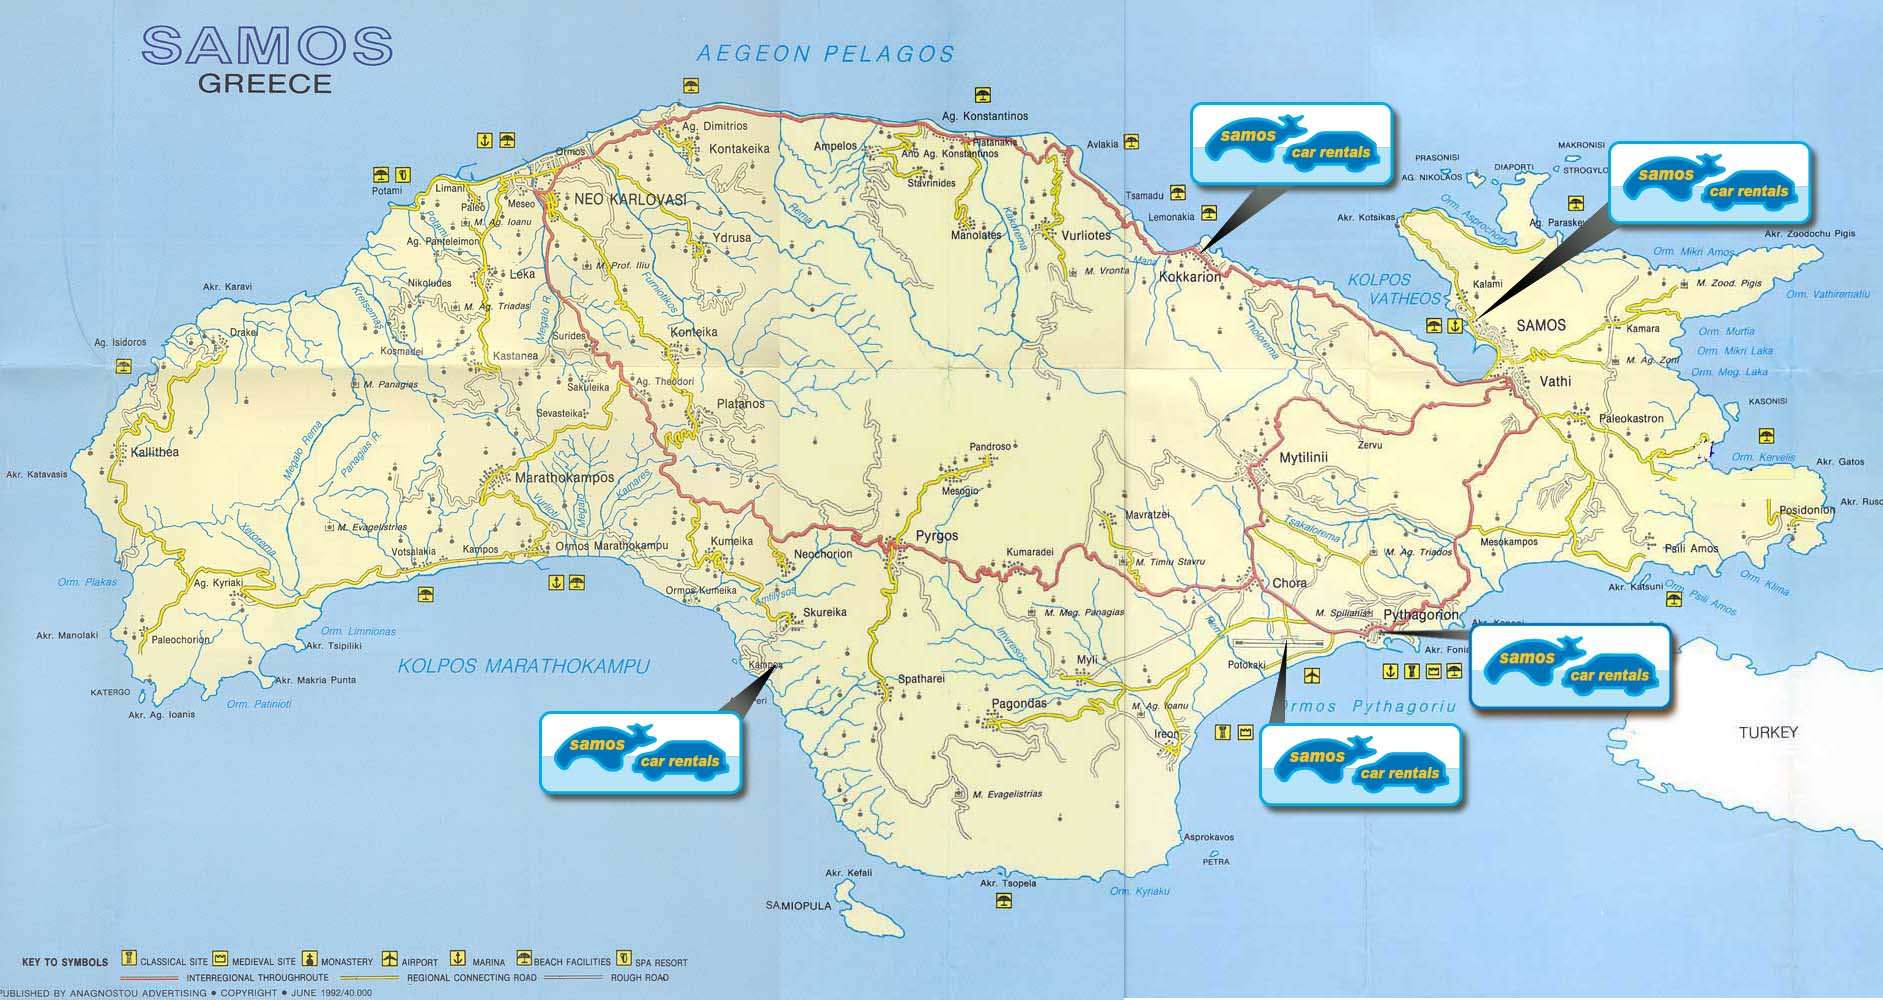 Samos Car Rentals Info And Links